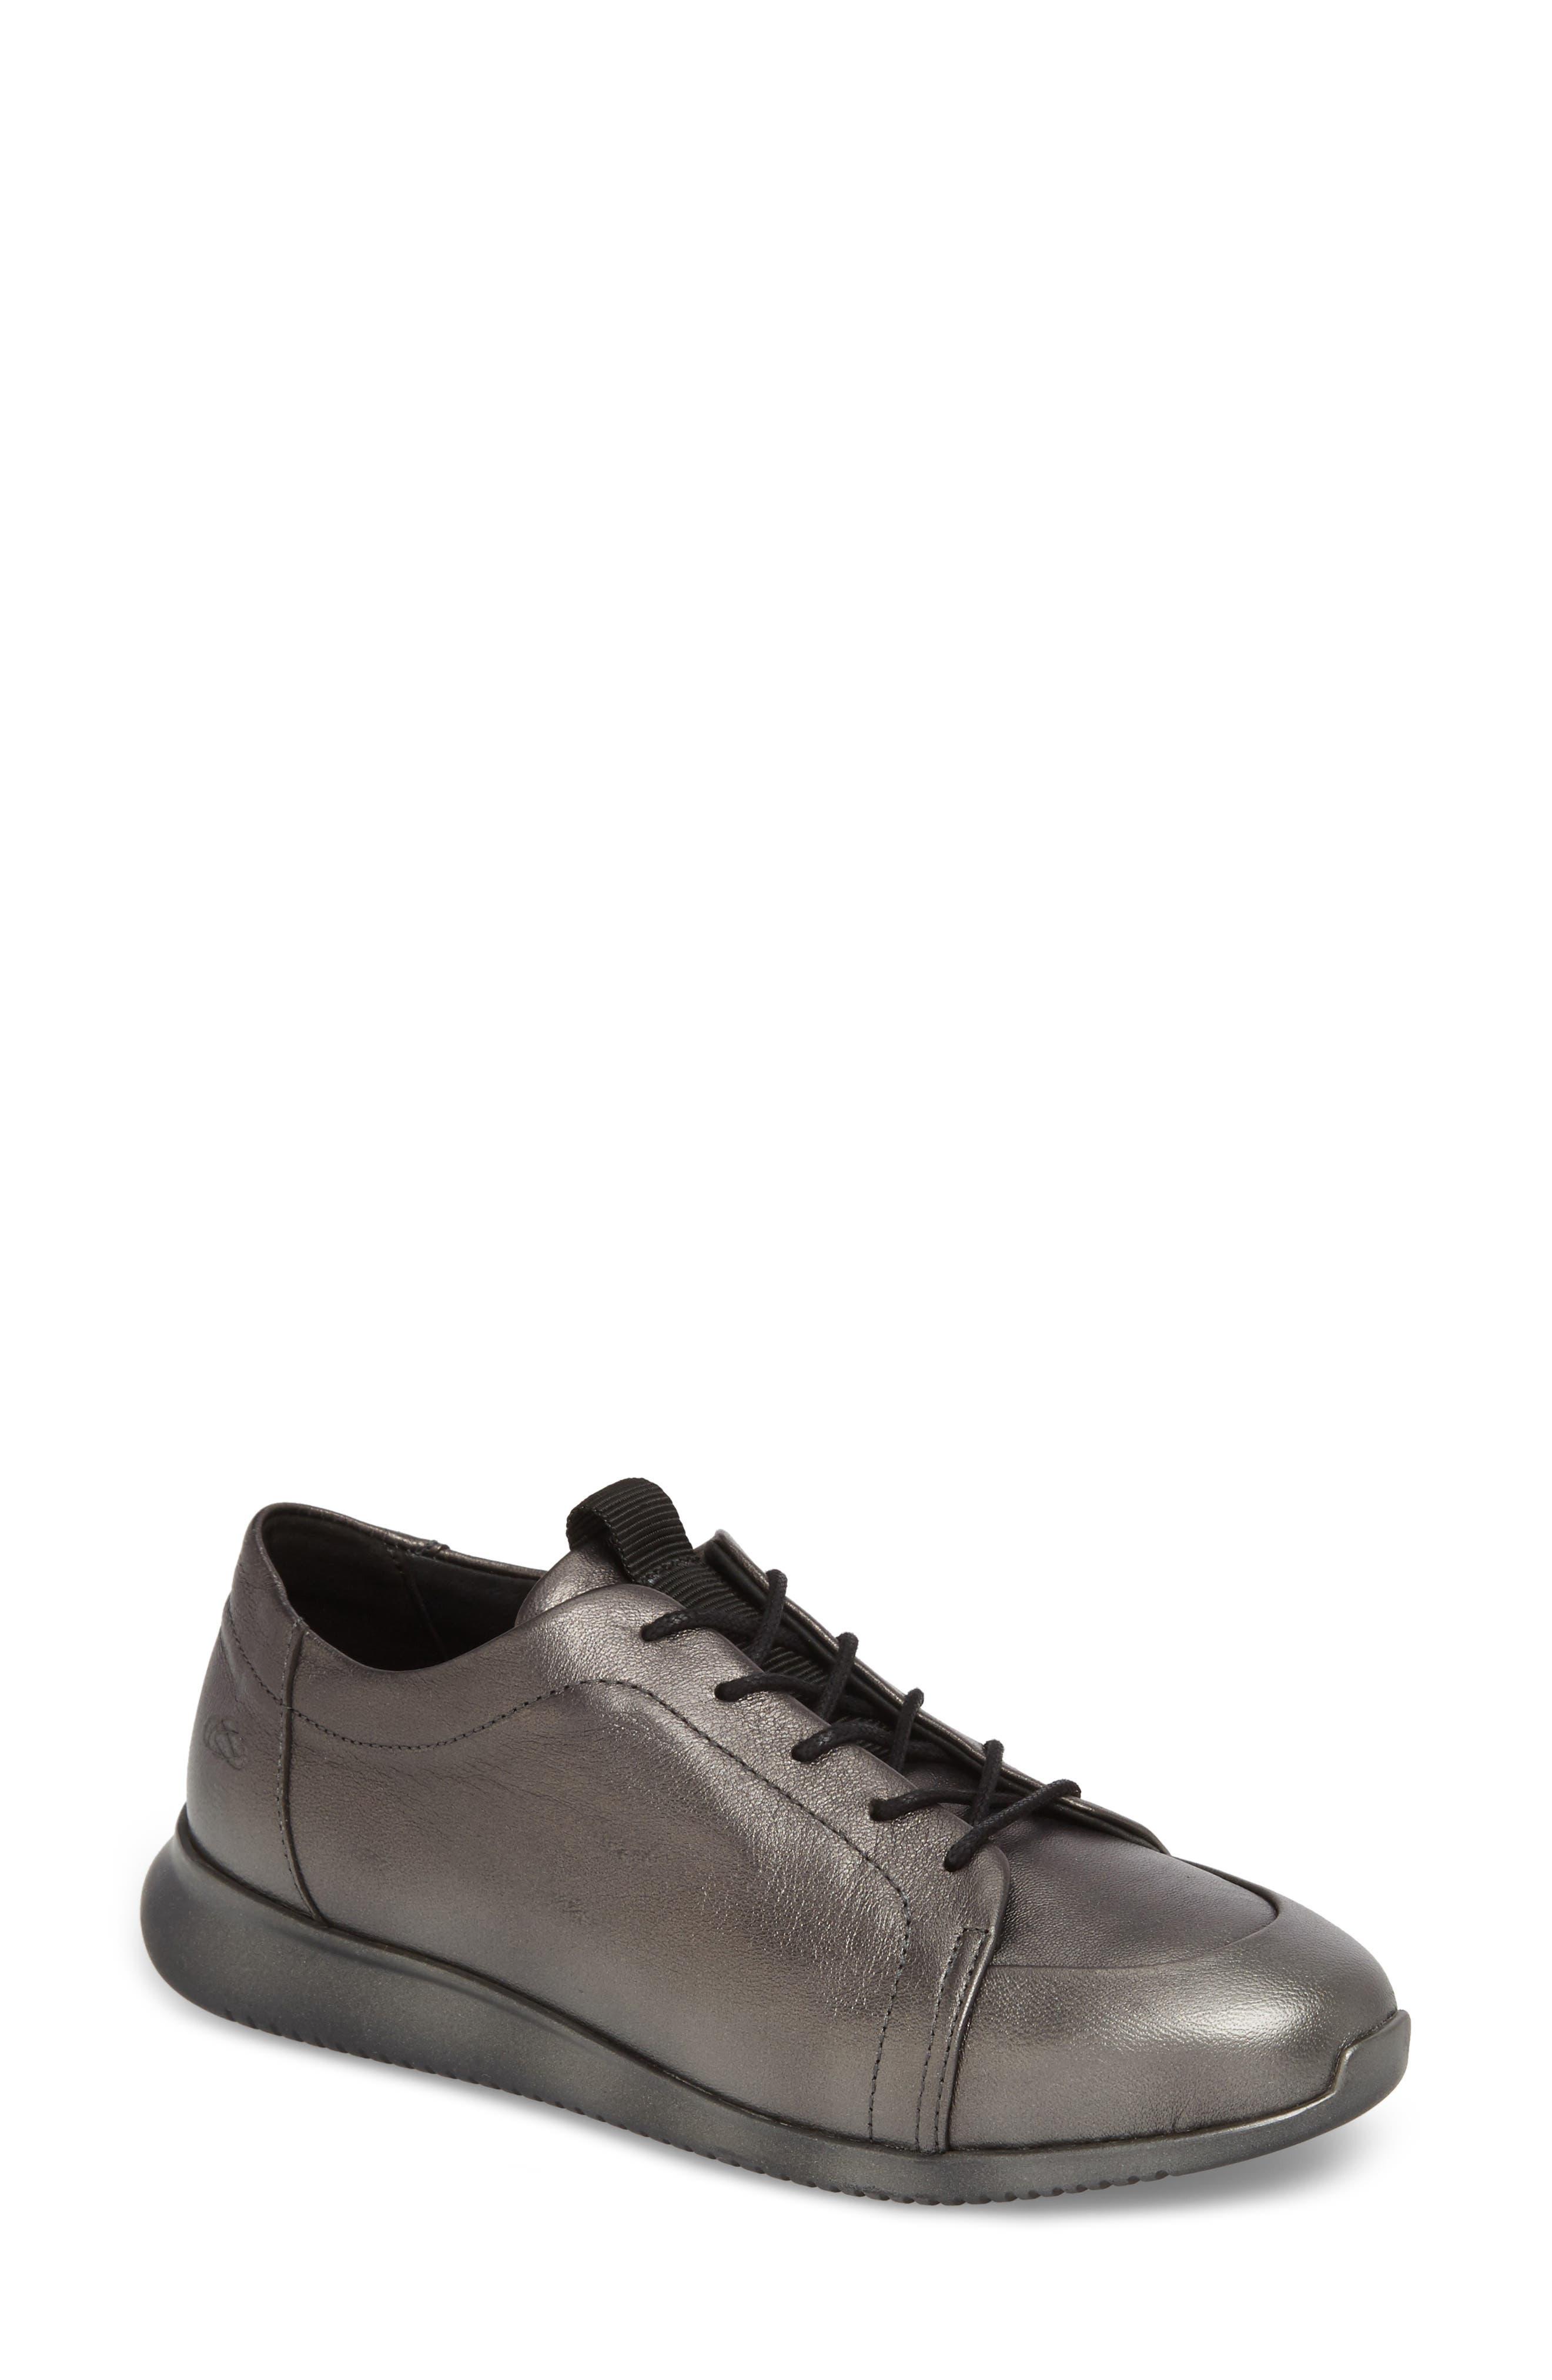 Ria Sneaker,                         Main,                         color, Pirita Leather